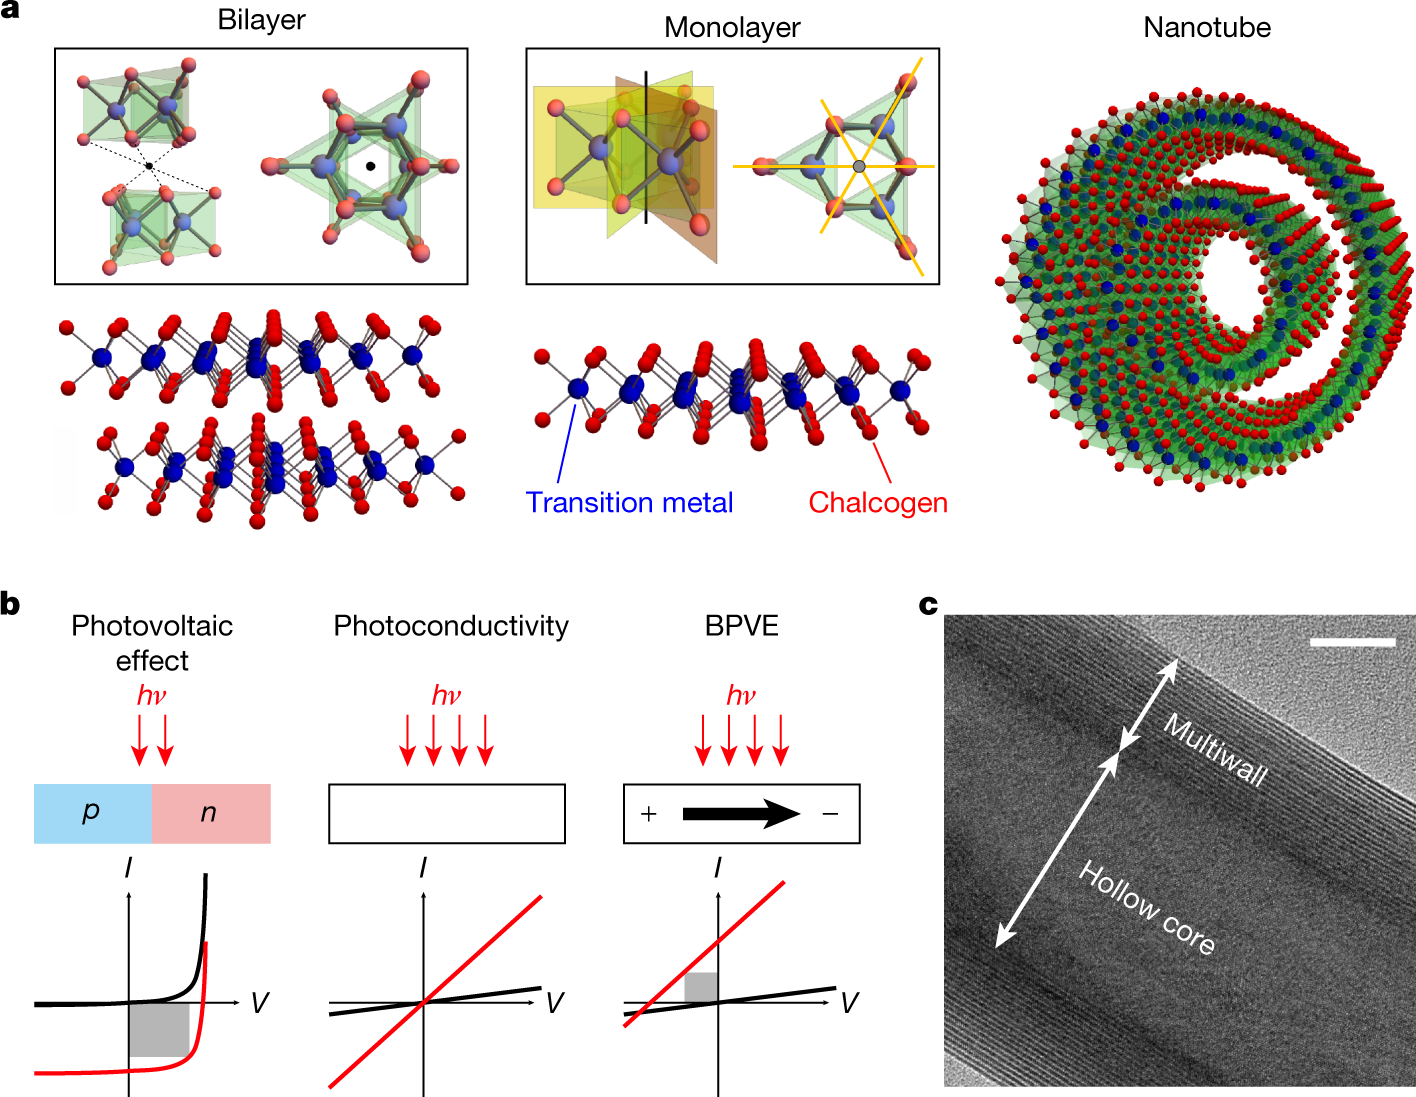 Enhanced intrinsic photovoltaic effect in tungsten disulfide nanotubes